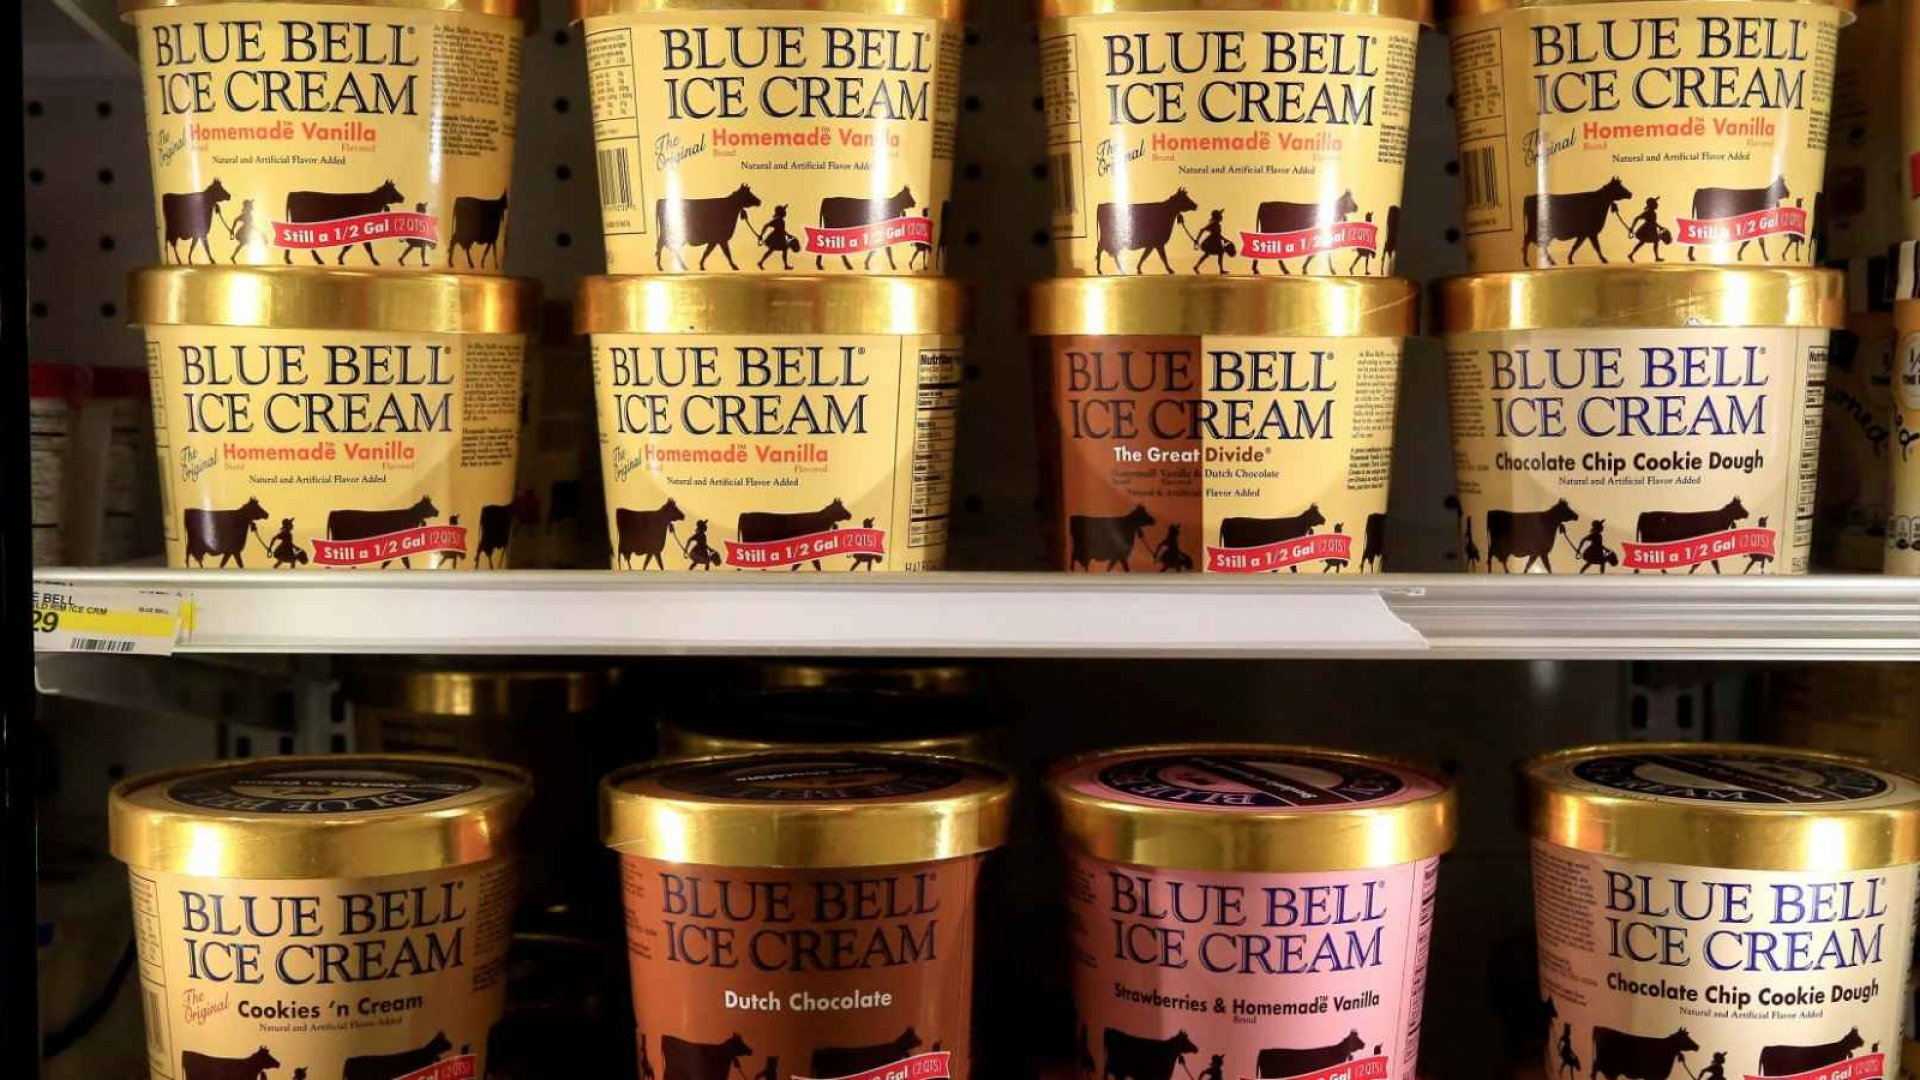 Blue Bell Creameries to Cut Jobs, Salaries Following Listeria Recall